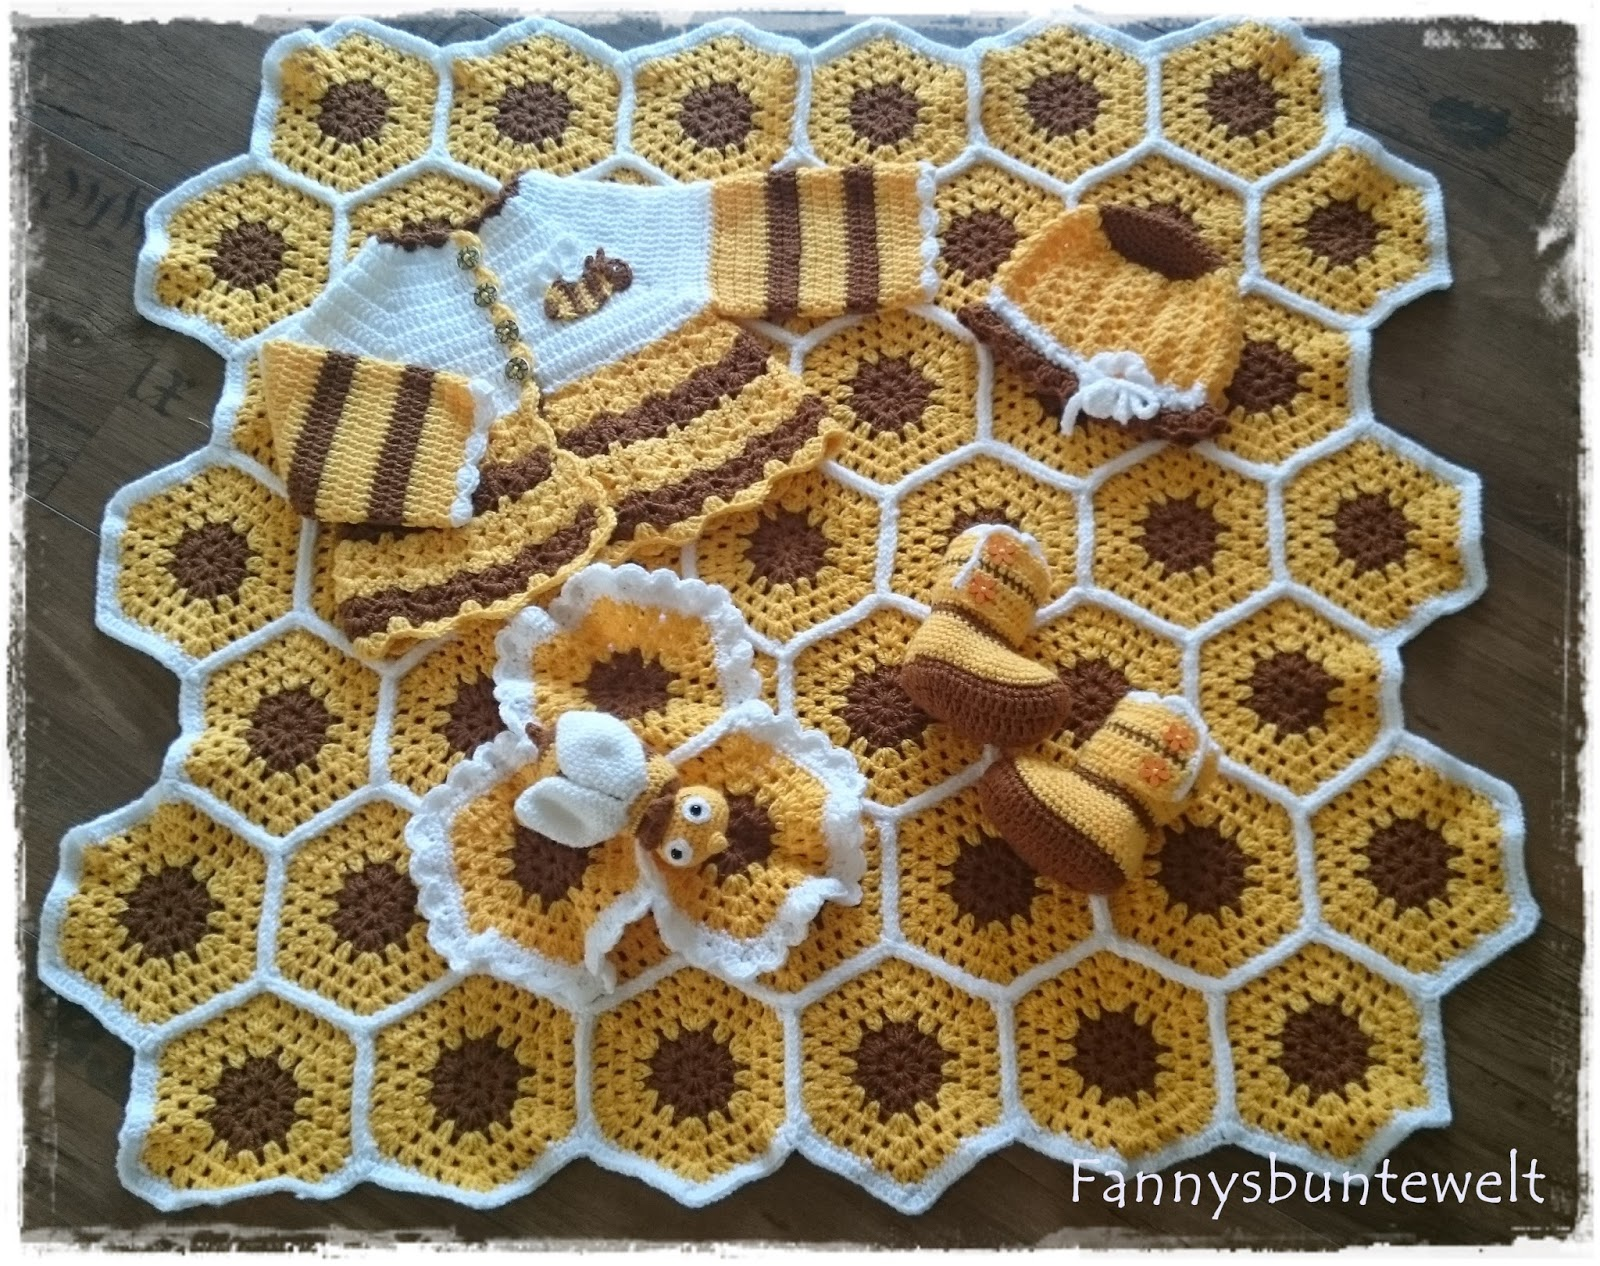 Fannysbuntewelt Babyset Thema Biene